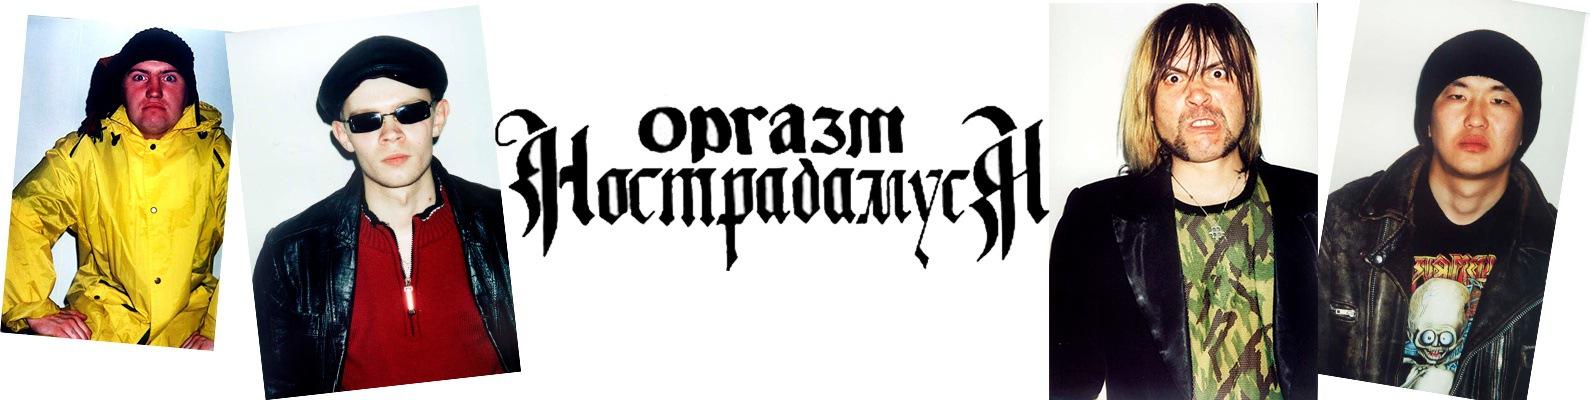 Маятник оргазм нострадамуса текст